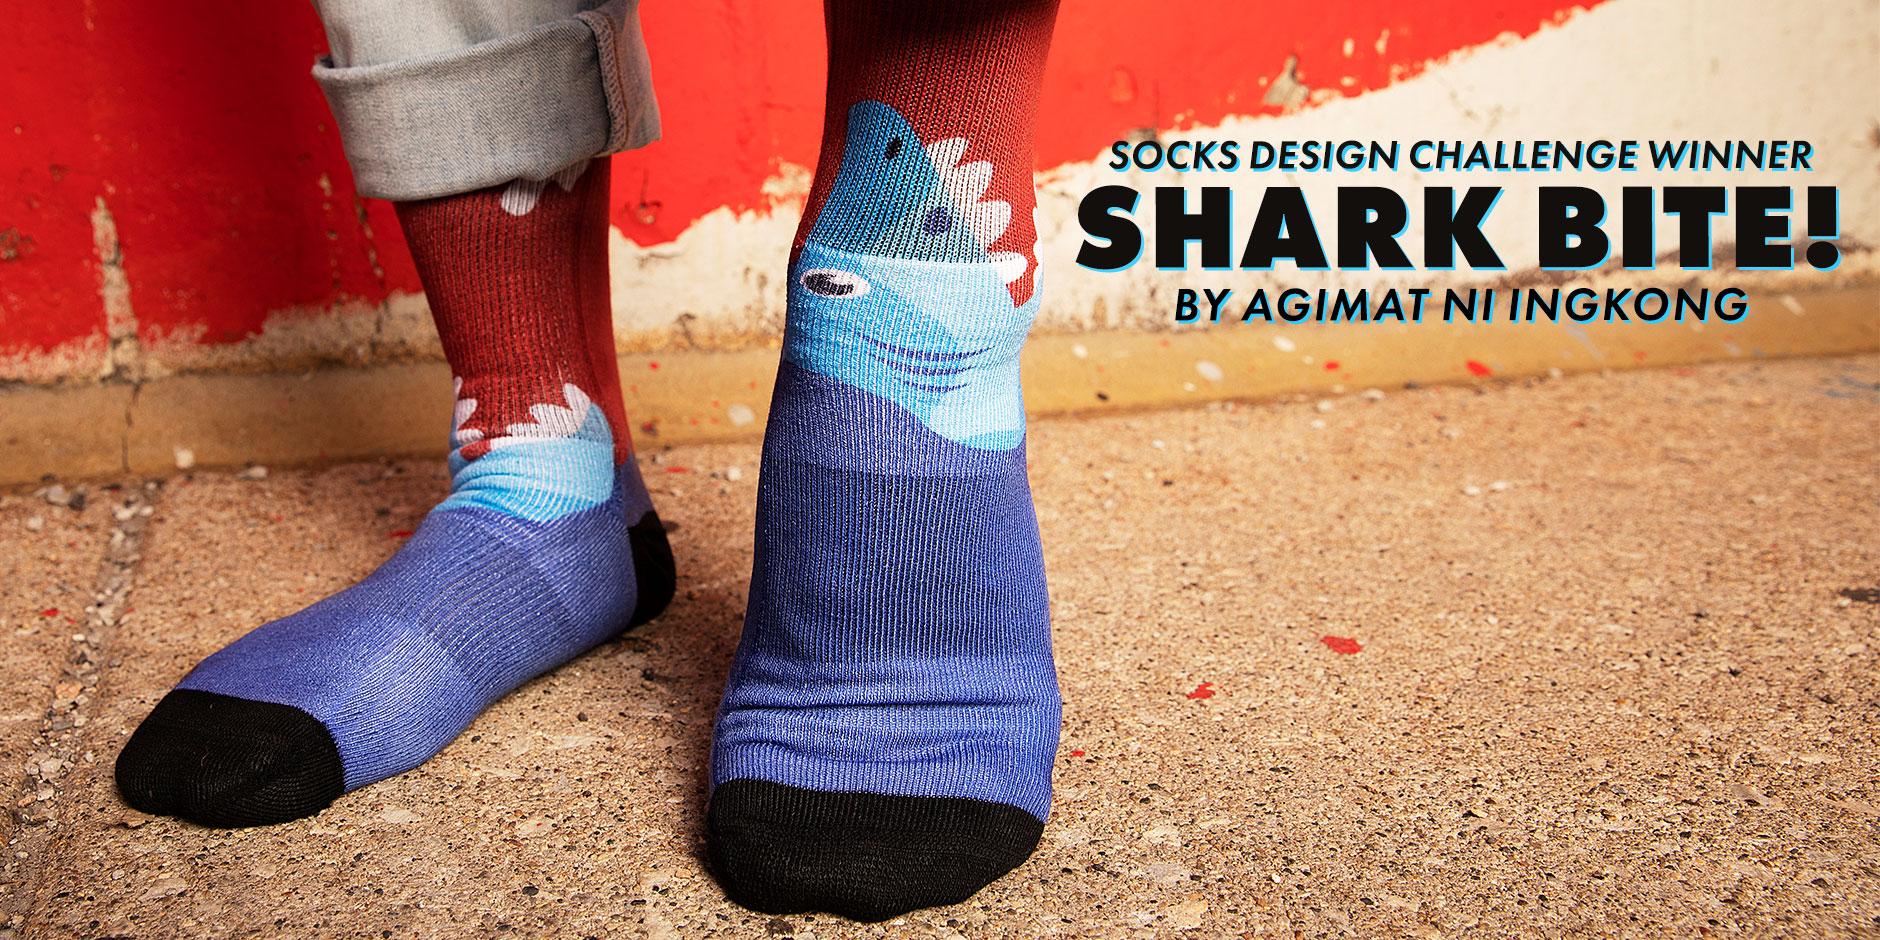 Featured Design: Shark Bite by Agimat ni Ingkong